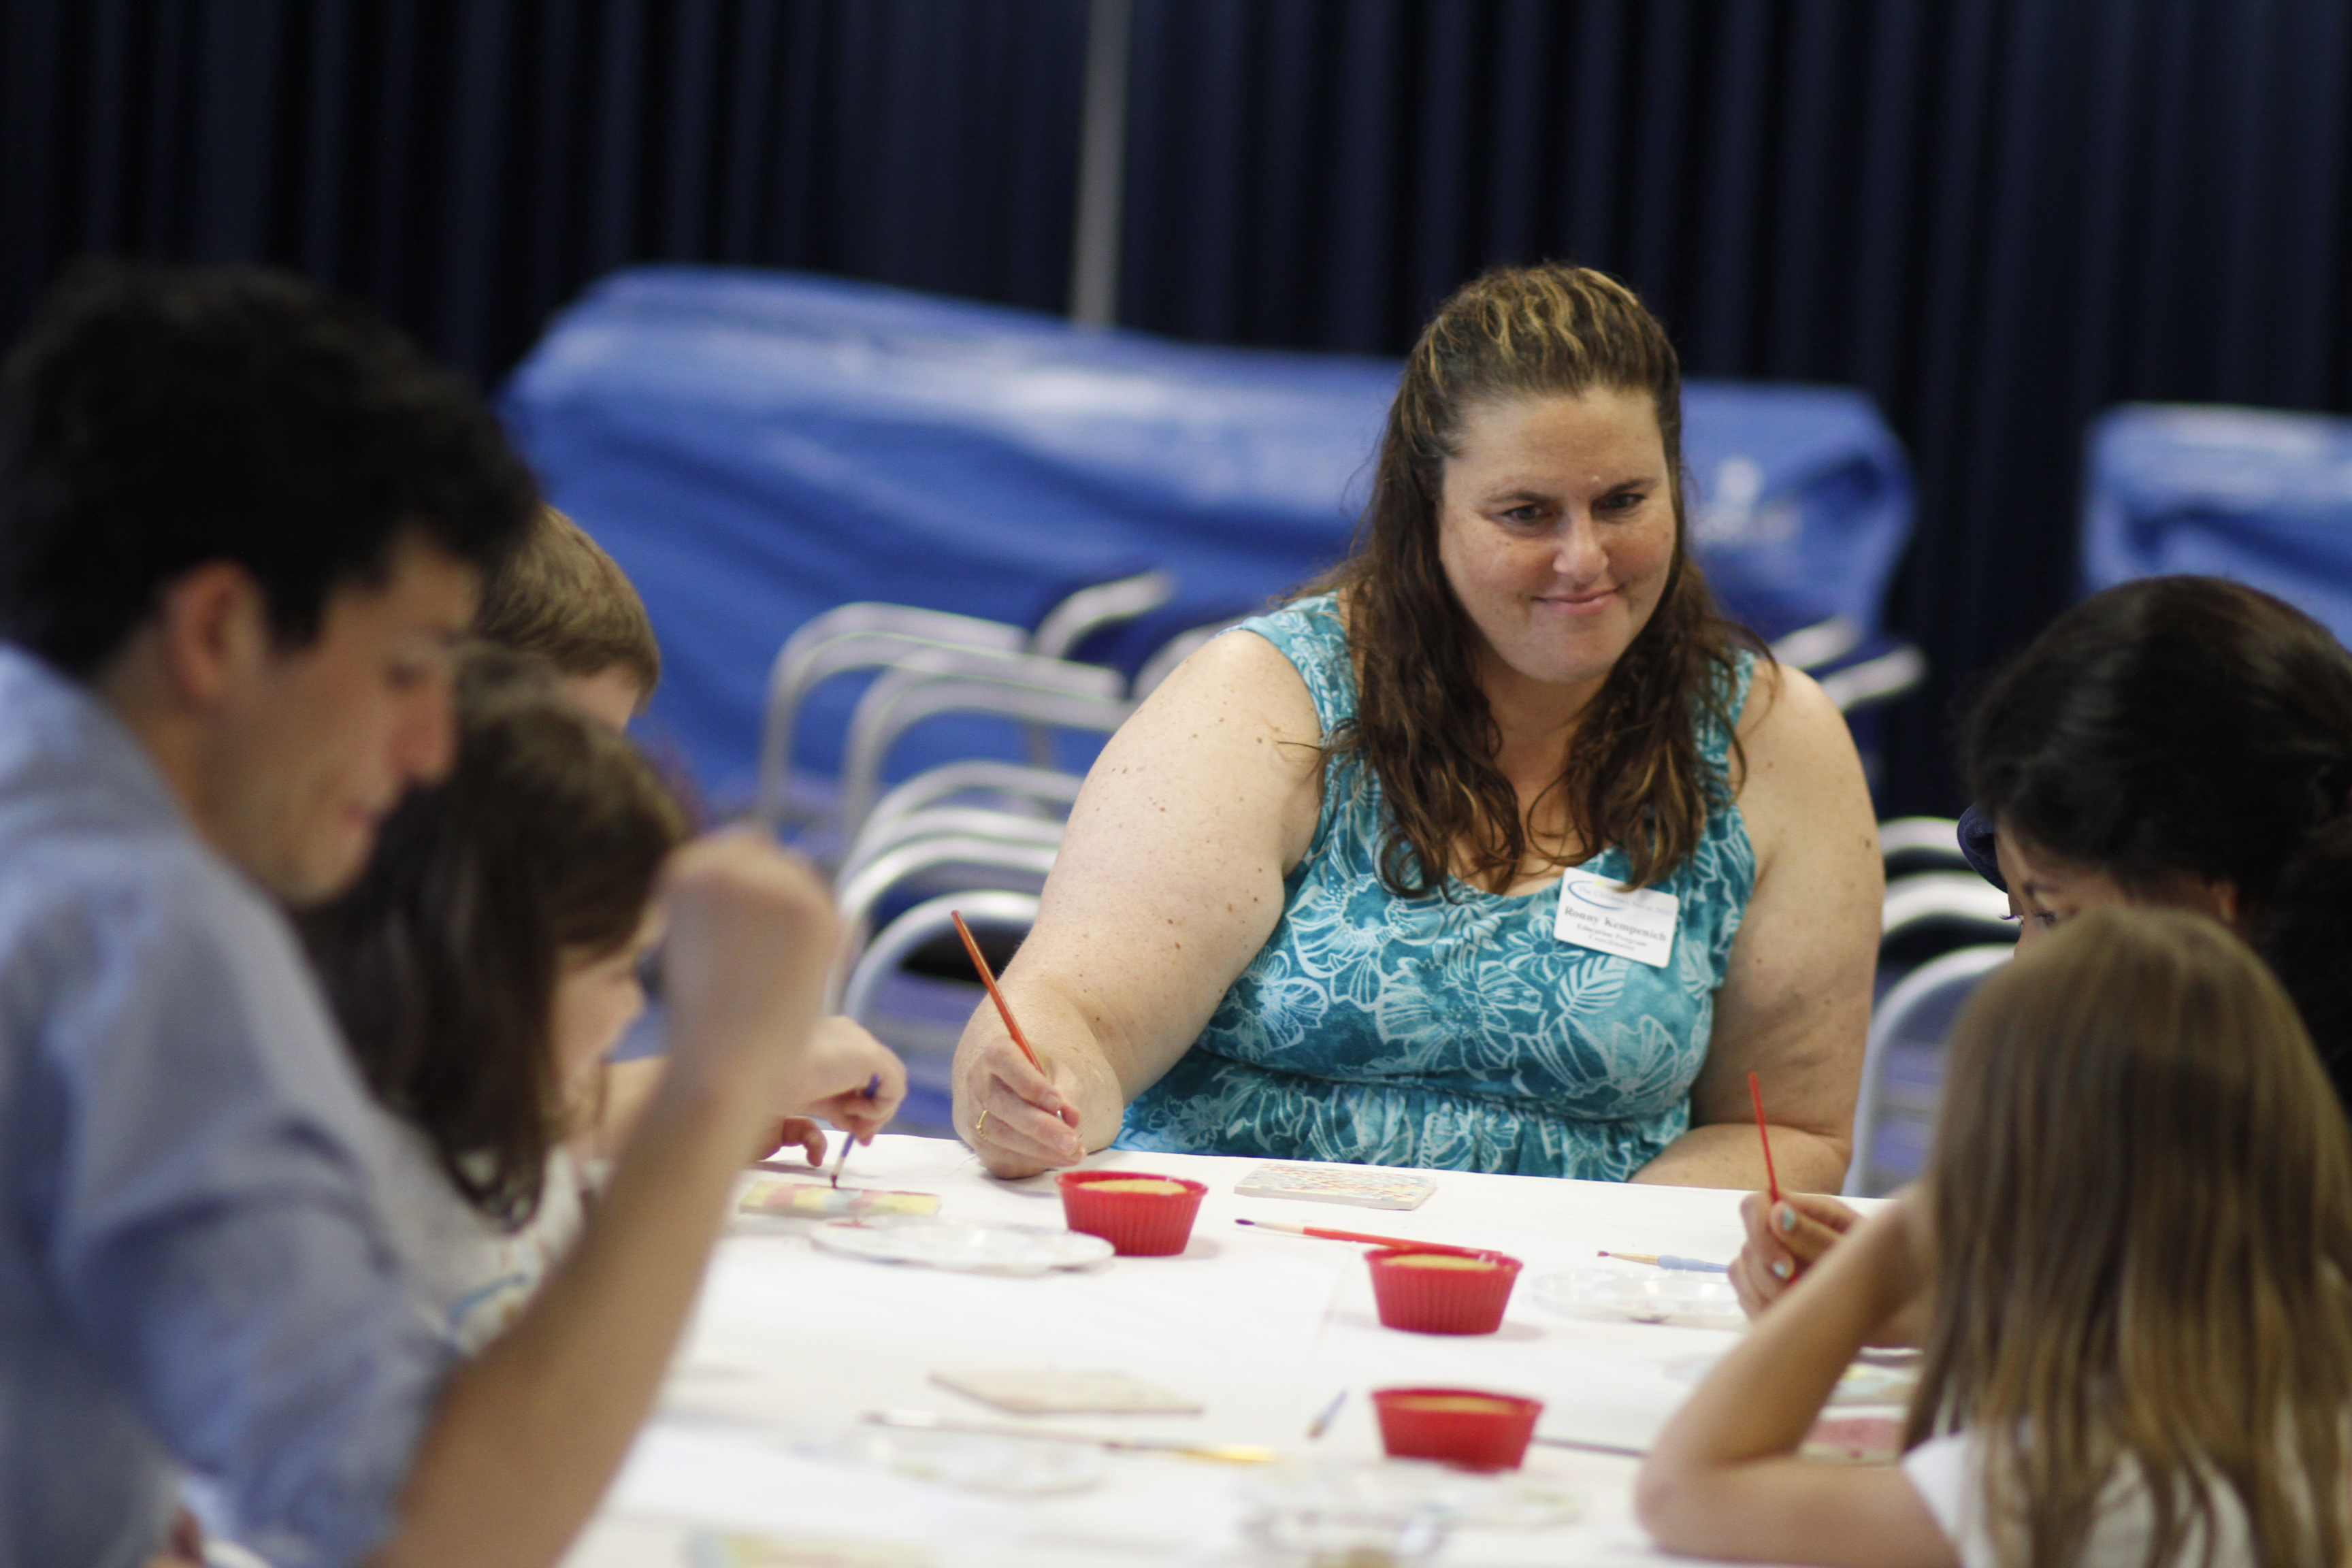 Ronny teacher arts and crafts at The Children's Inn summer camp